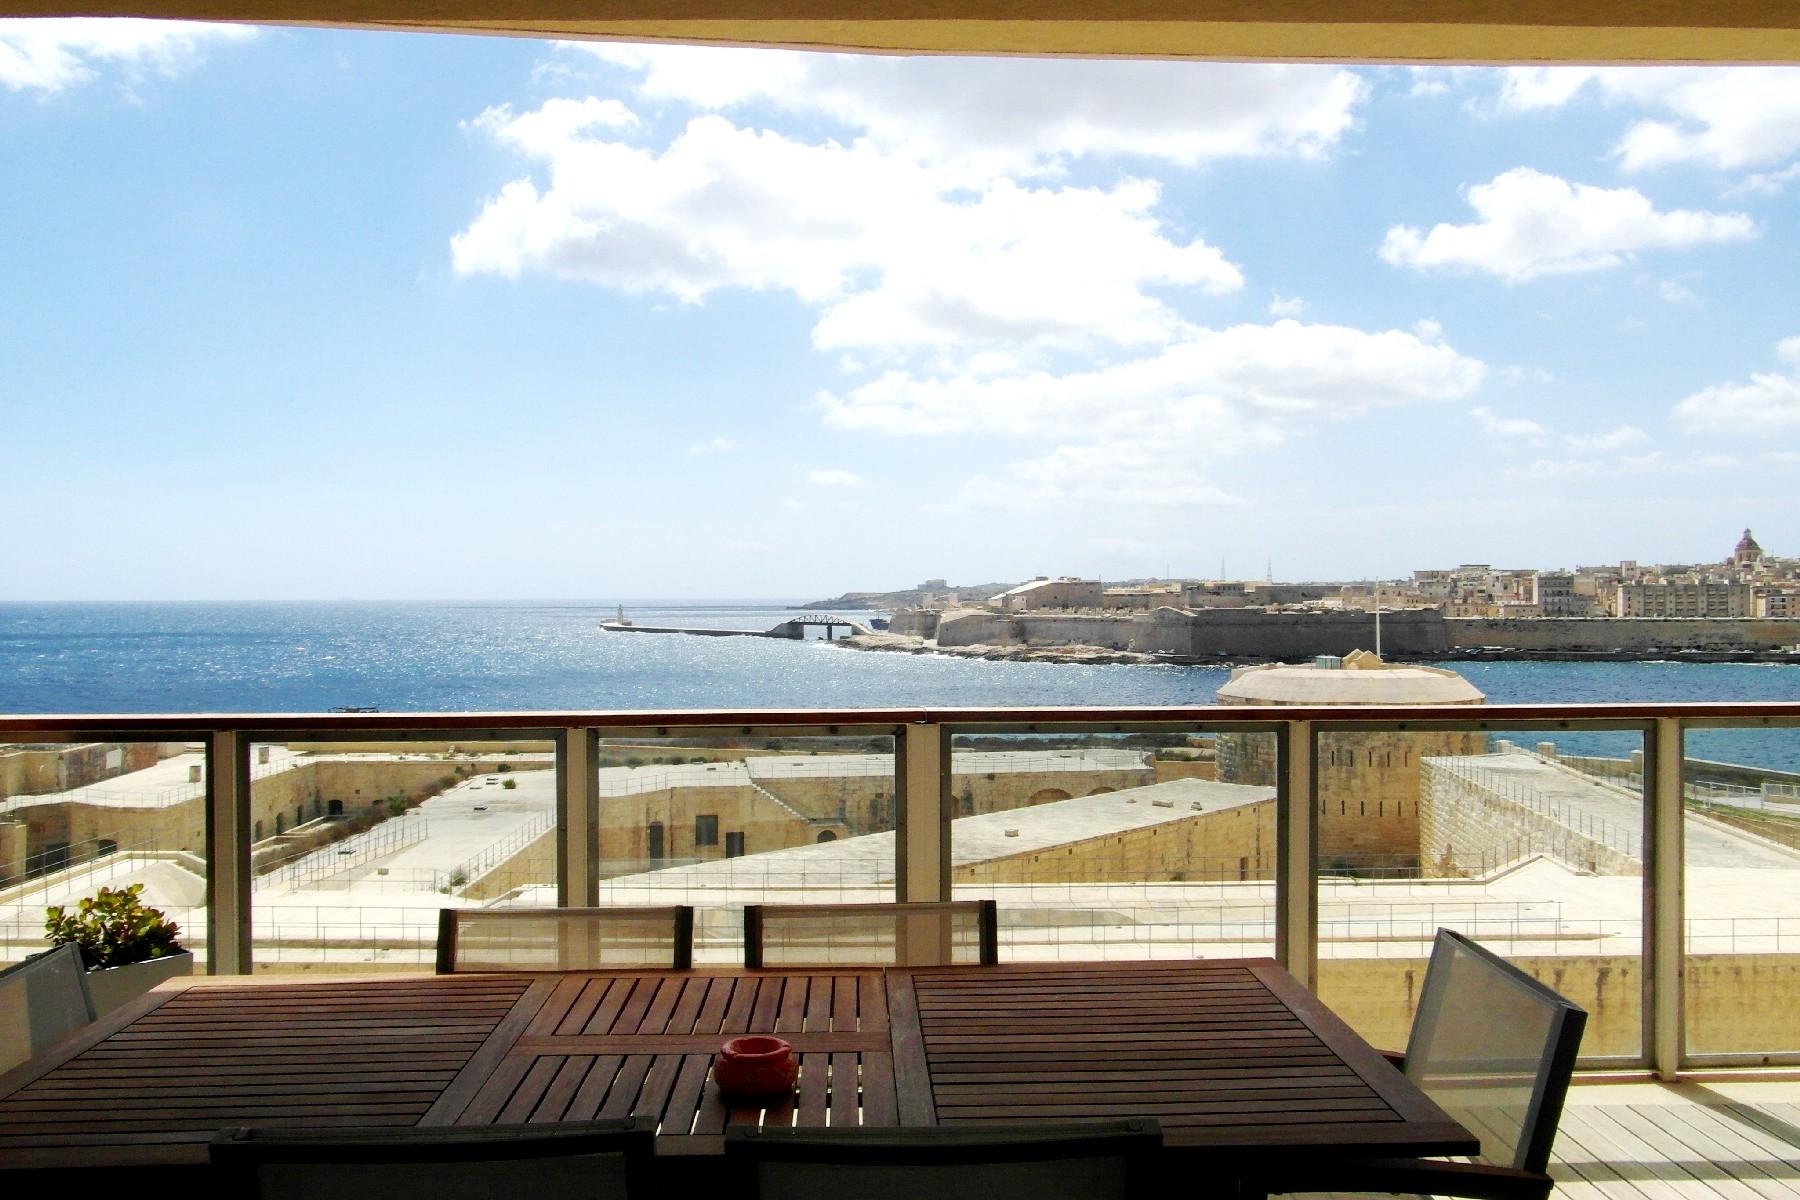 شقة للـ Rent في Luxury Seaview Apartment Tigne Point, Sliema, Malta